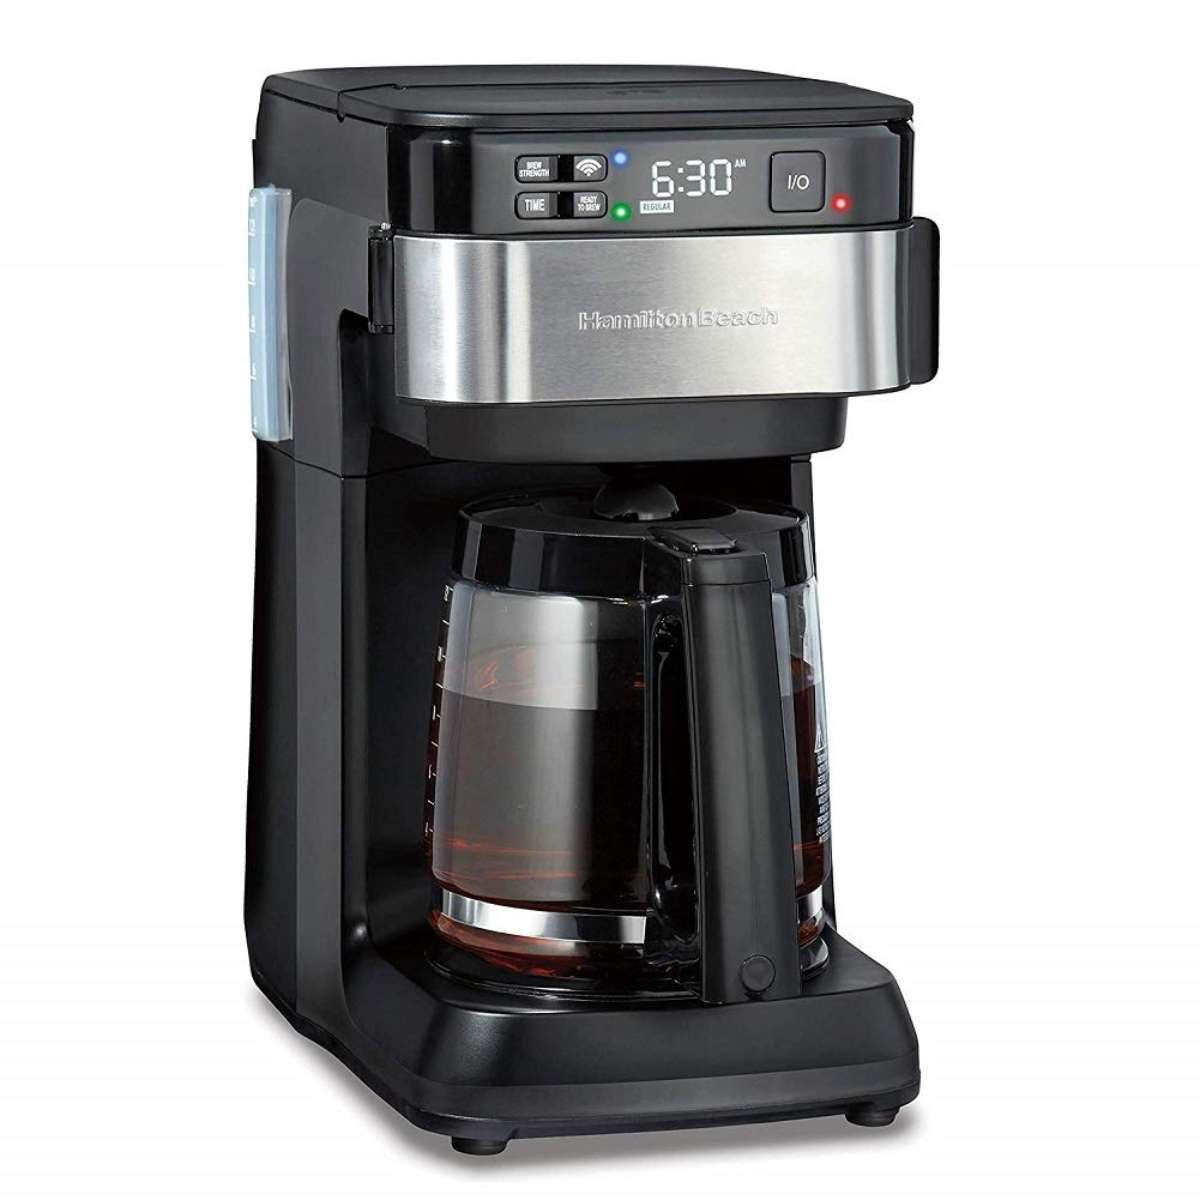 Hamilton Beach Smart Coffee Maker